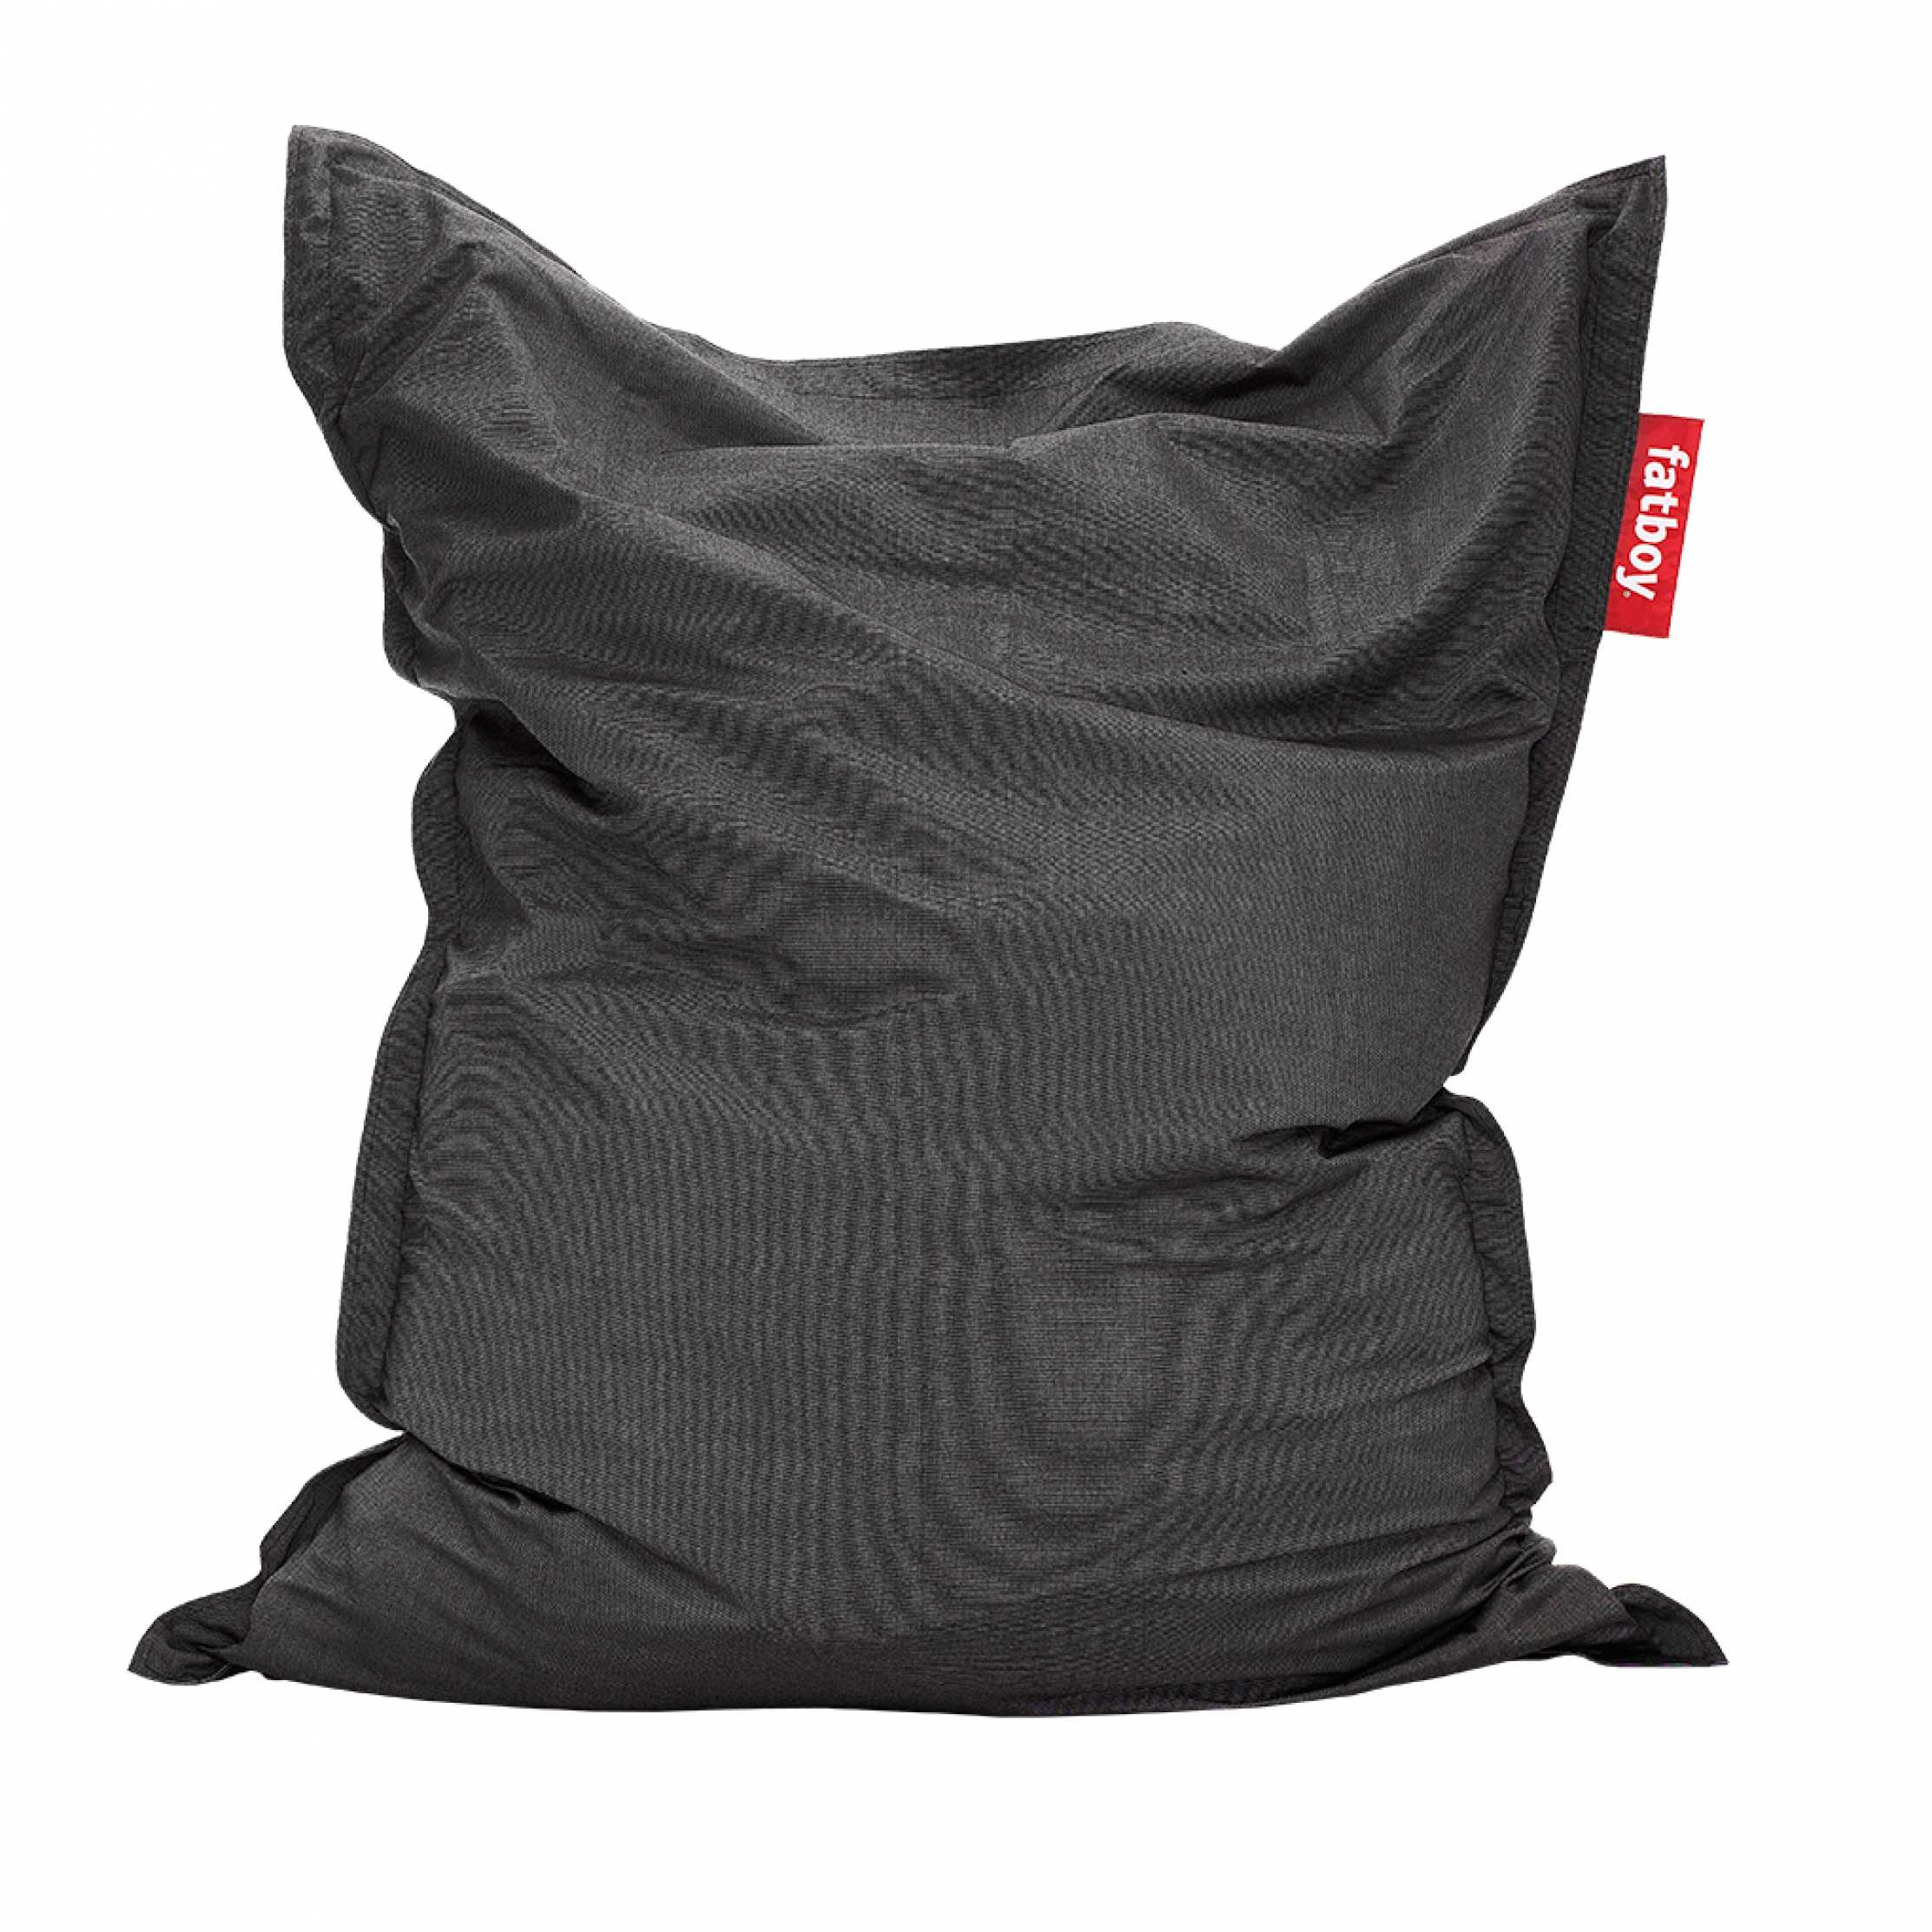 Strange Fat Boy Bean Bag Outdoor Home Yacht Linen And Interiors Cjindustries Chair Design For Home Cjindustriesco